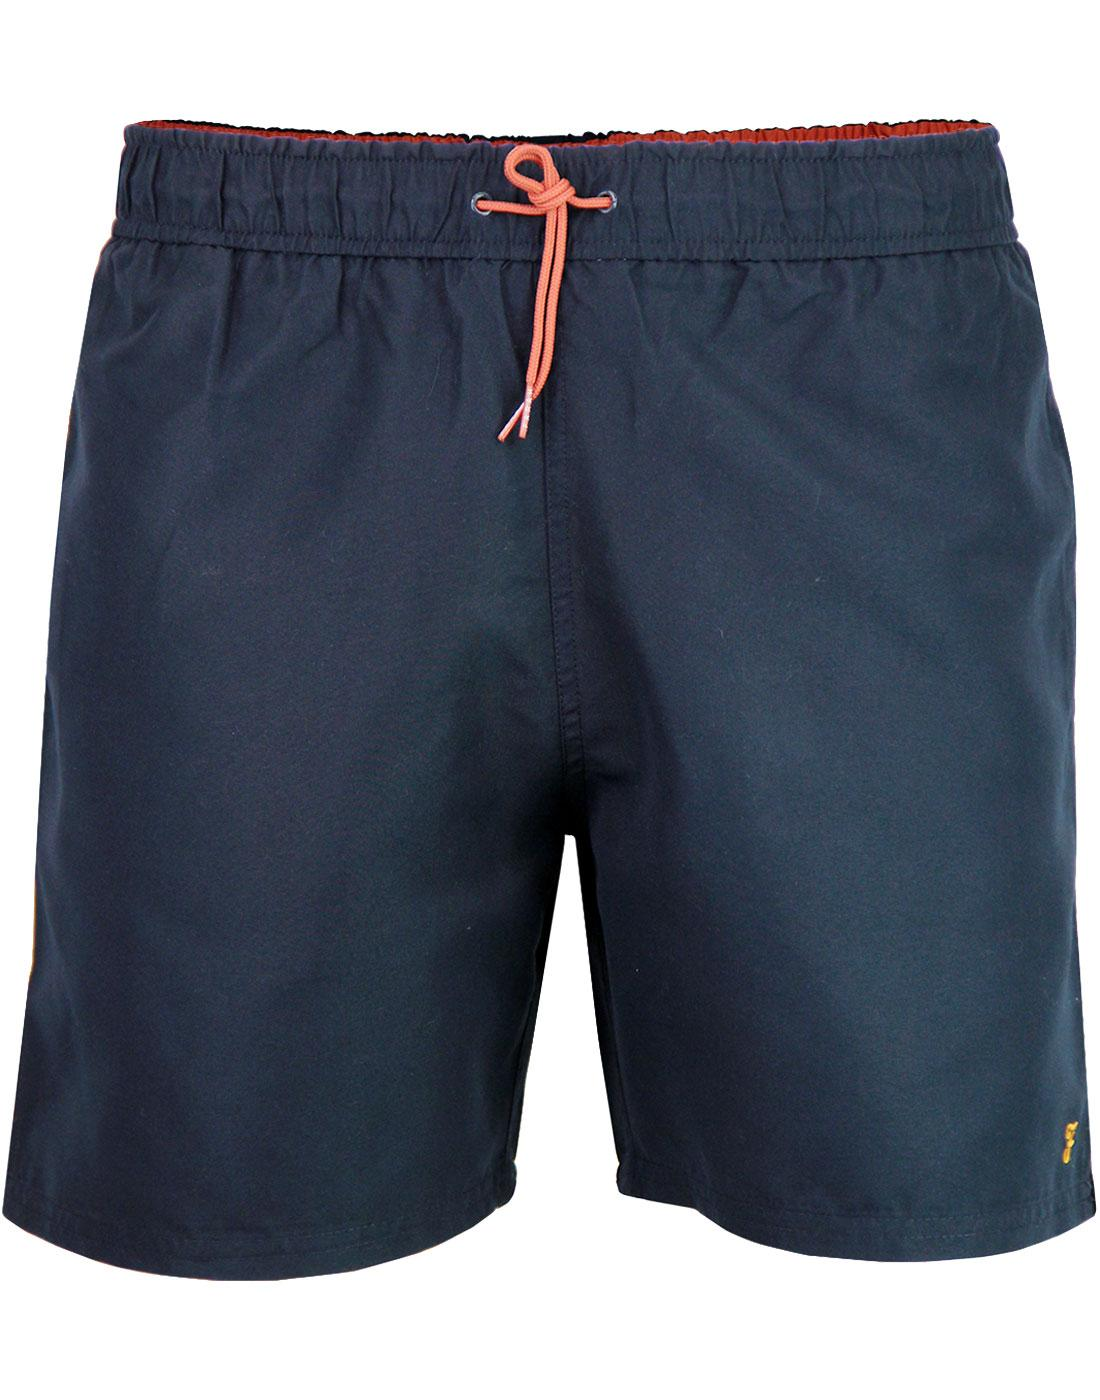 Colbert FARAH Retro Contrast Trim Swim Shorts NAVY